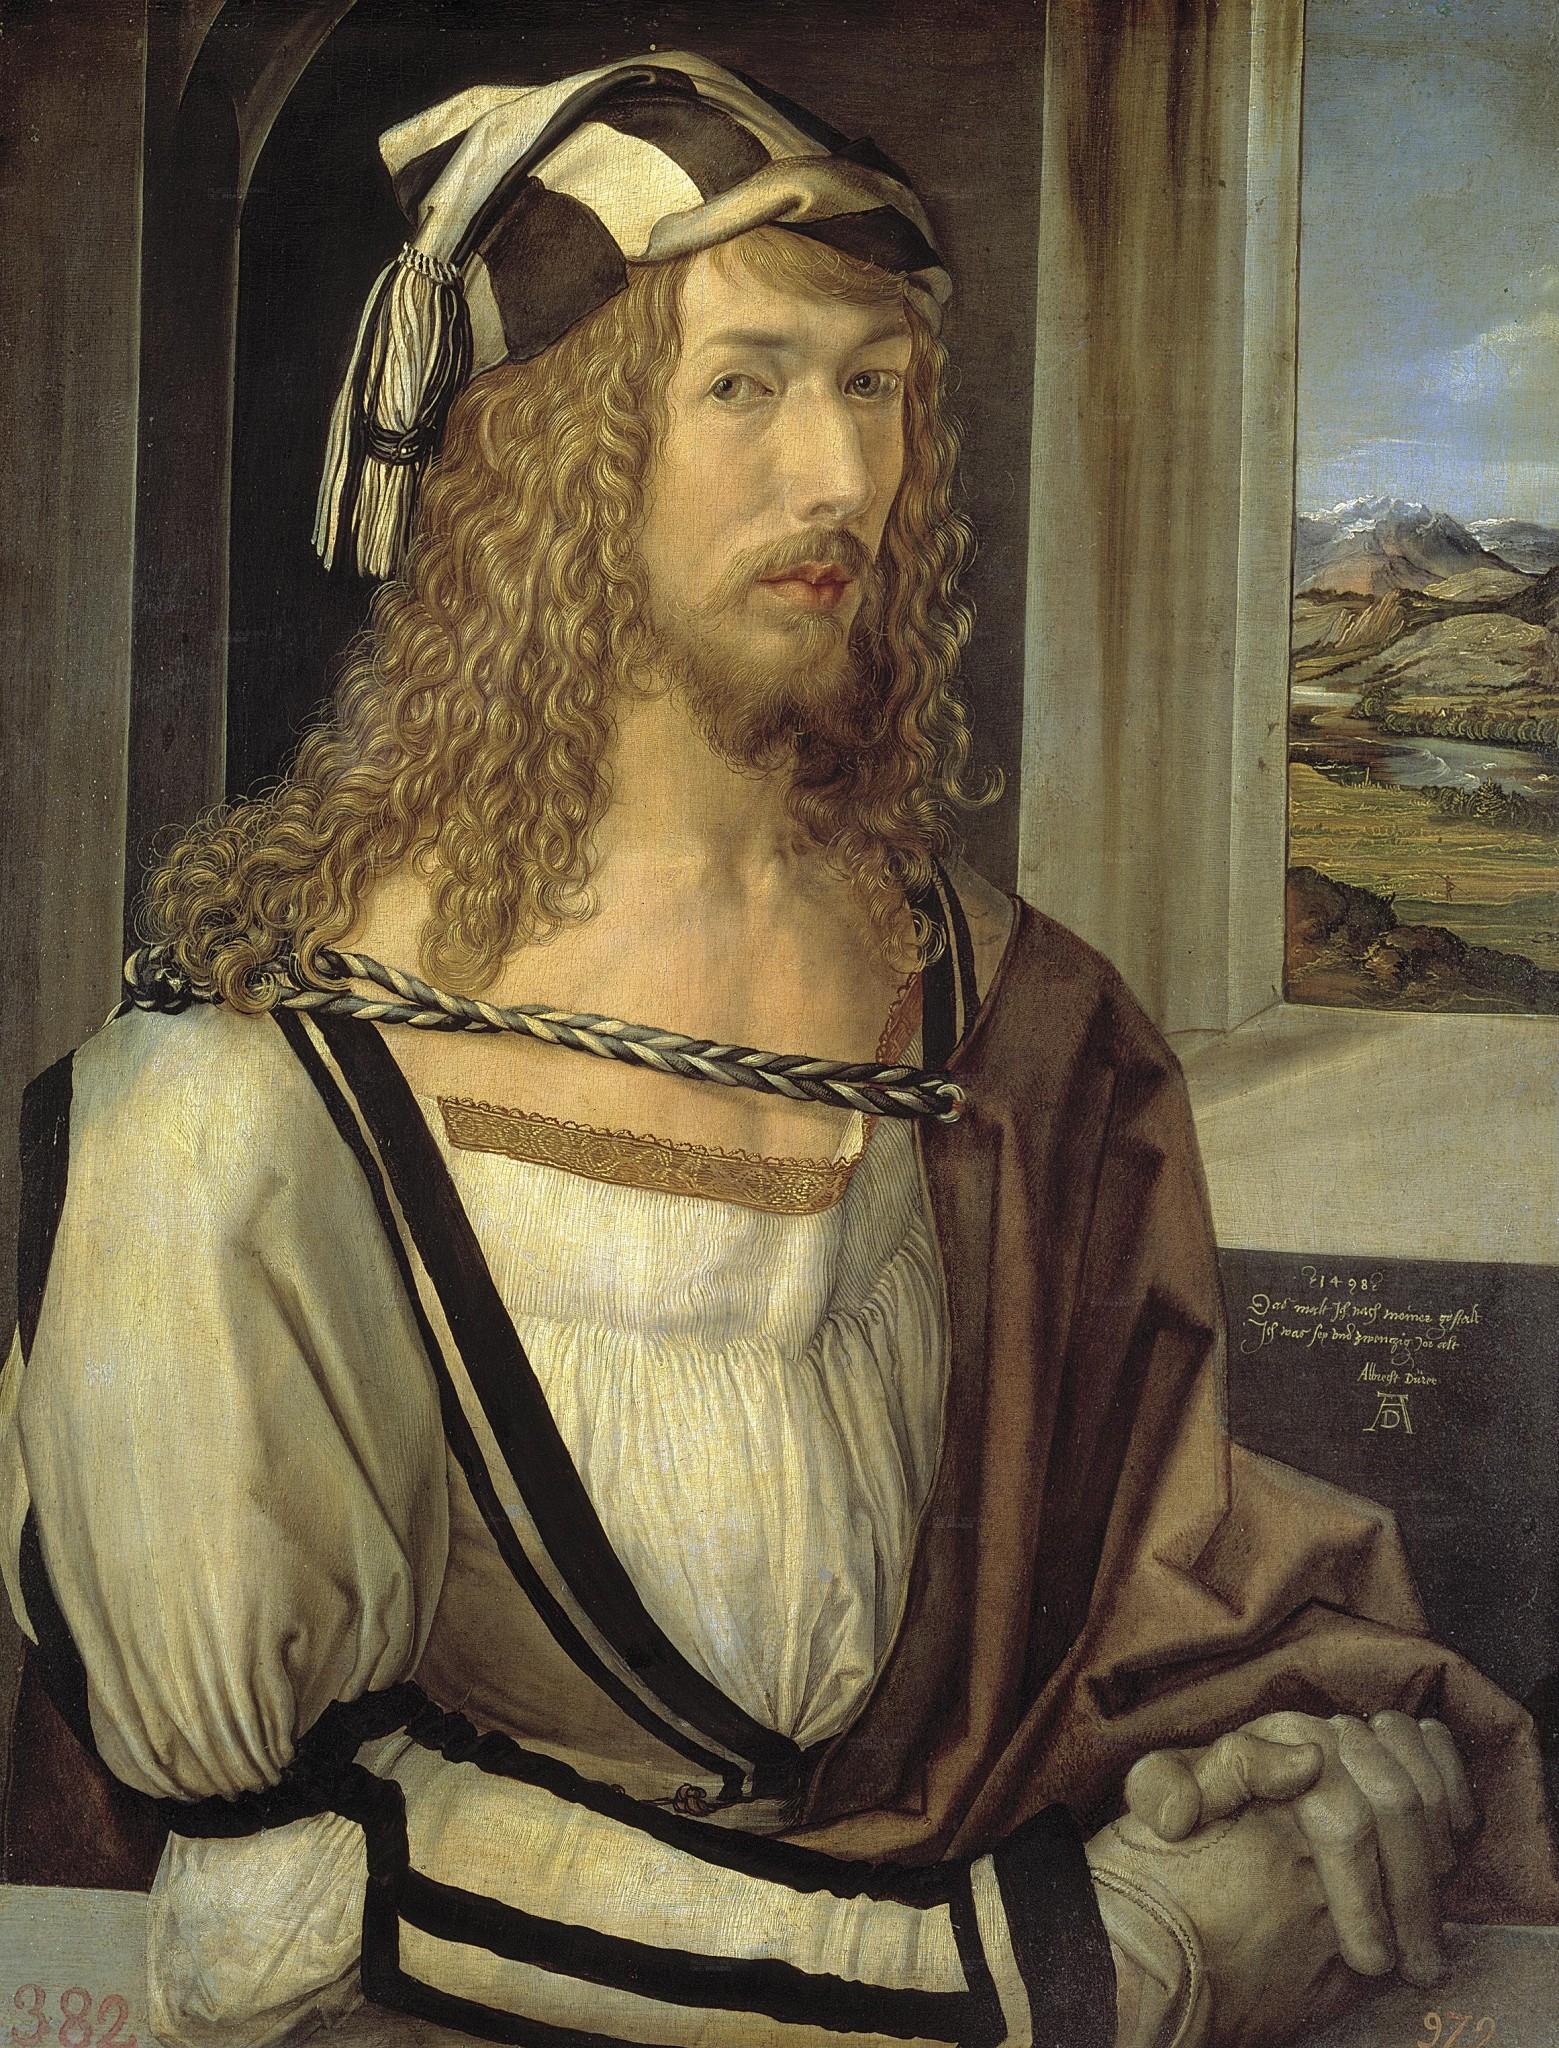 Albrecht Dürer (1498. Автопортрет в 26 лет)